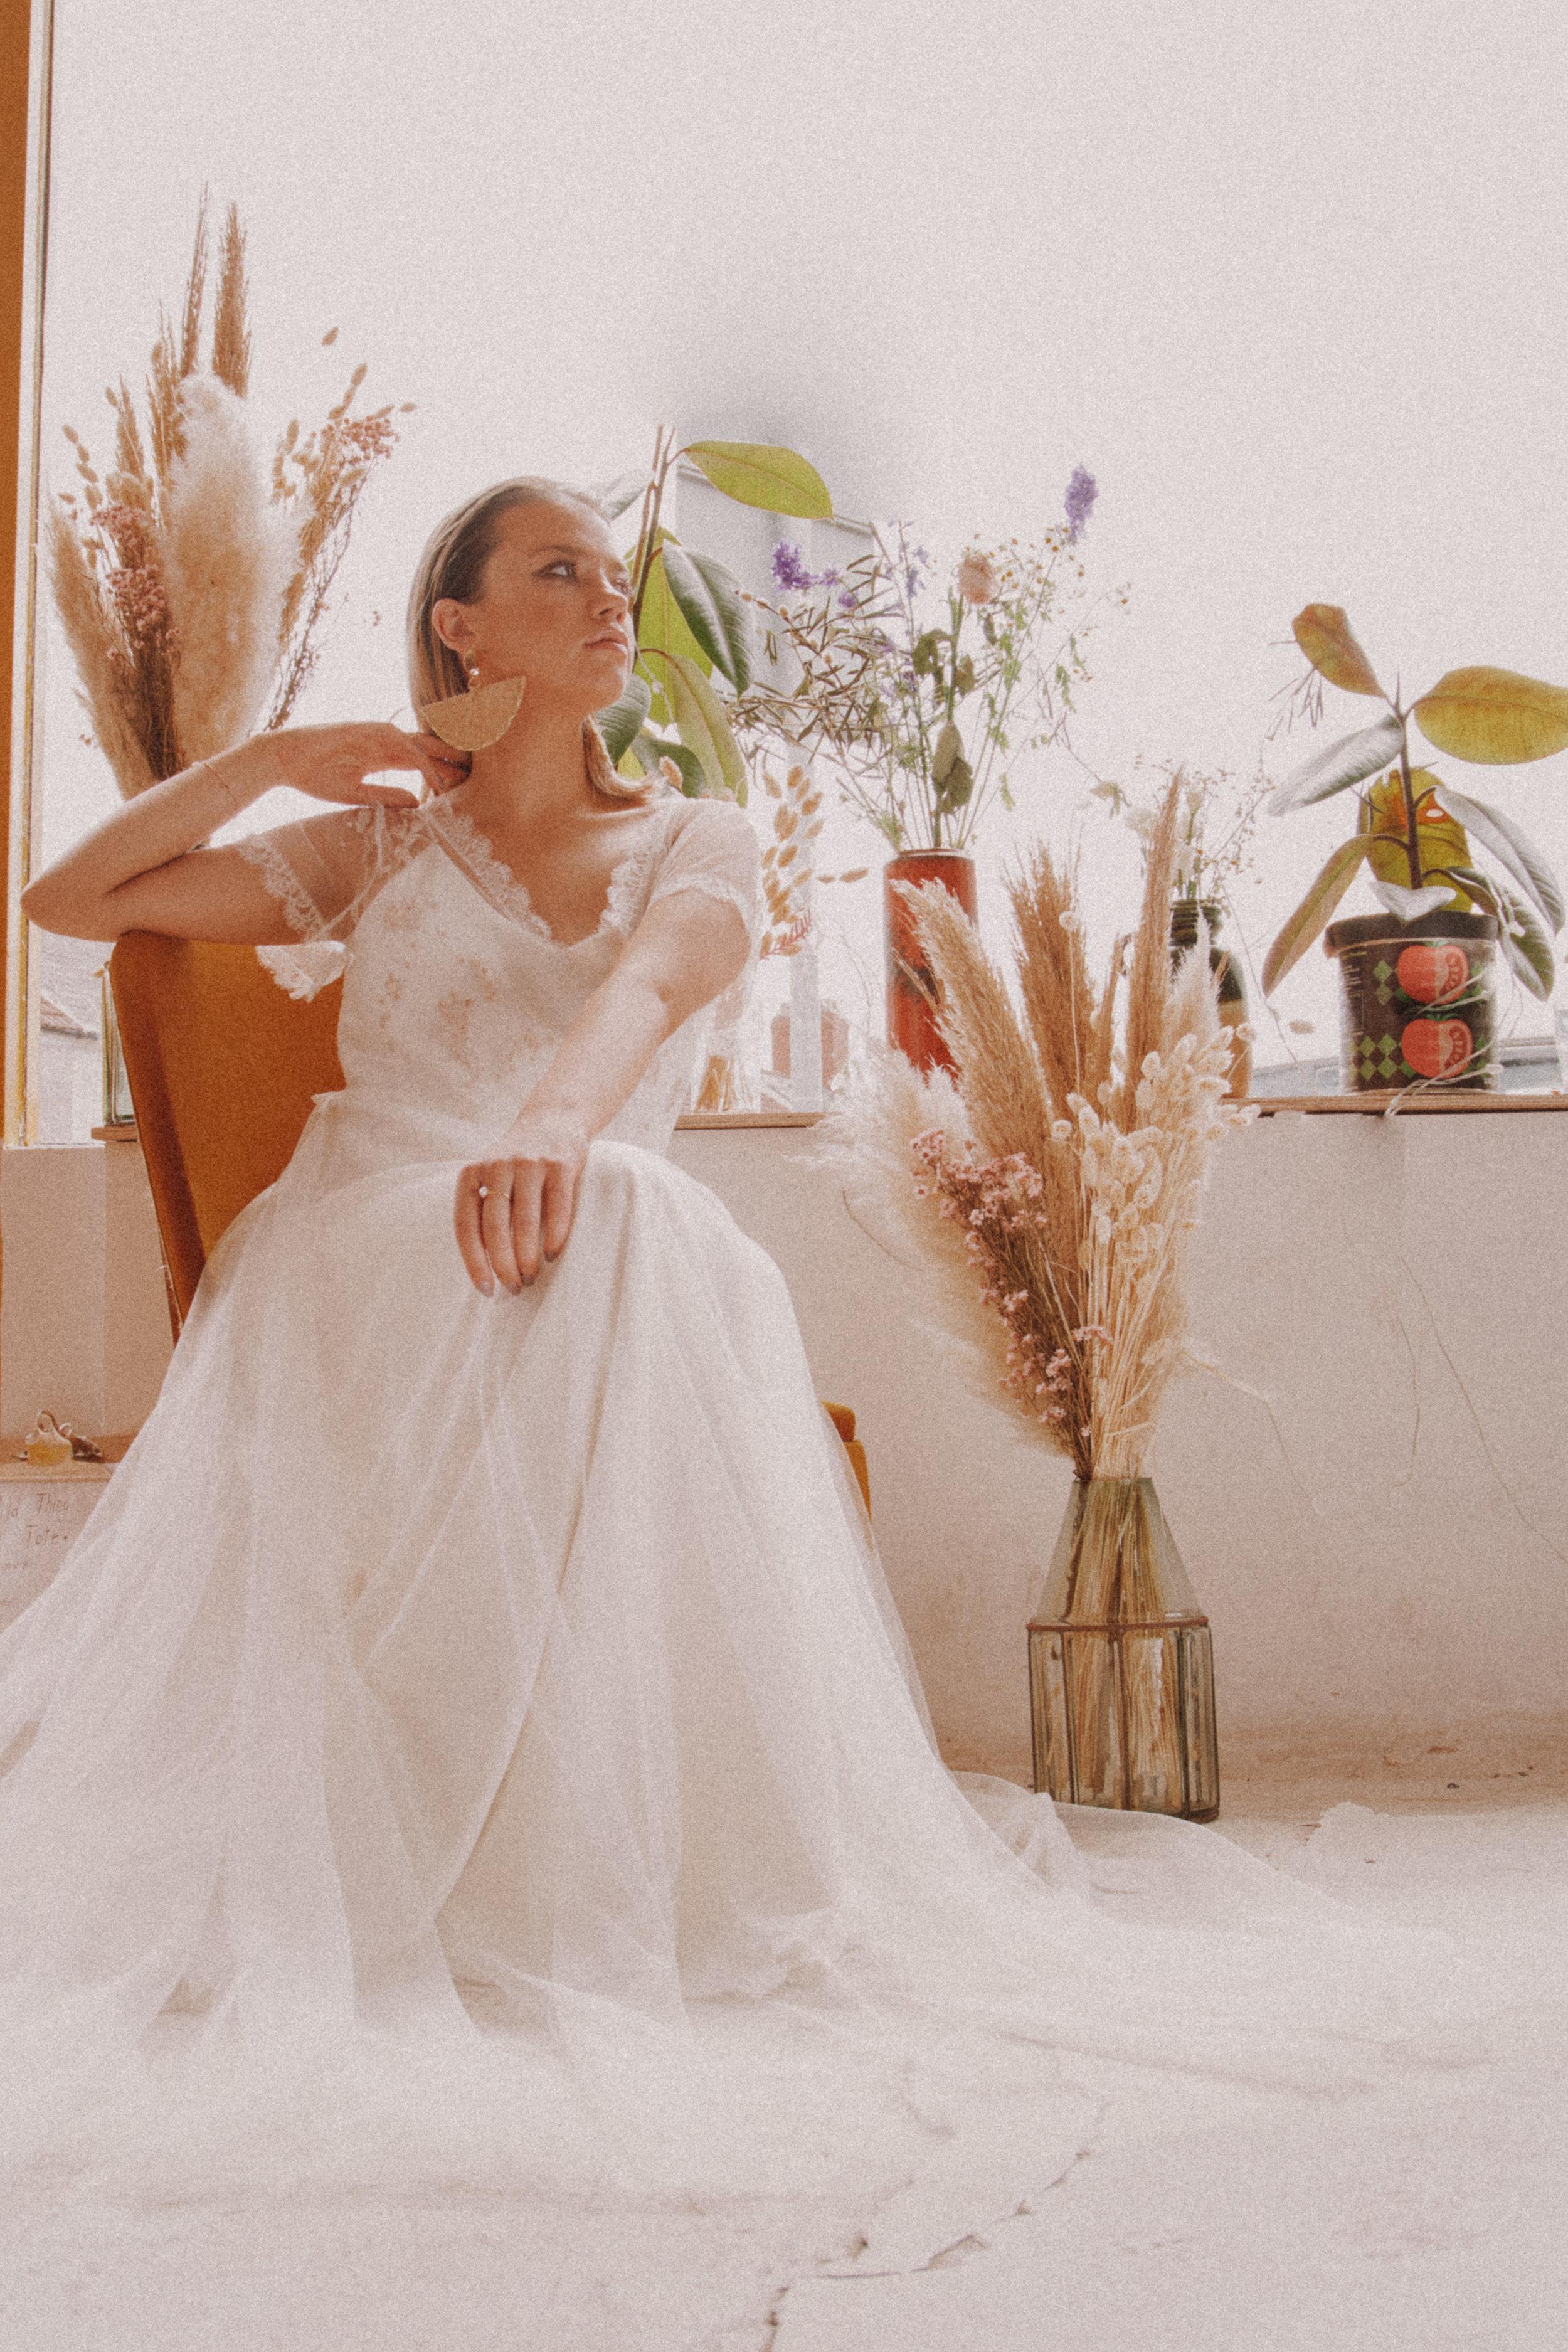 Rachel Burgess Bridal Boutique - Lovebird. Photo by Mefus Photography.#2.jpg